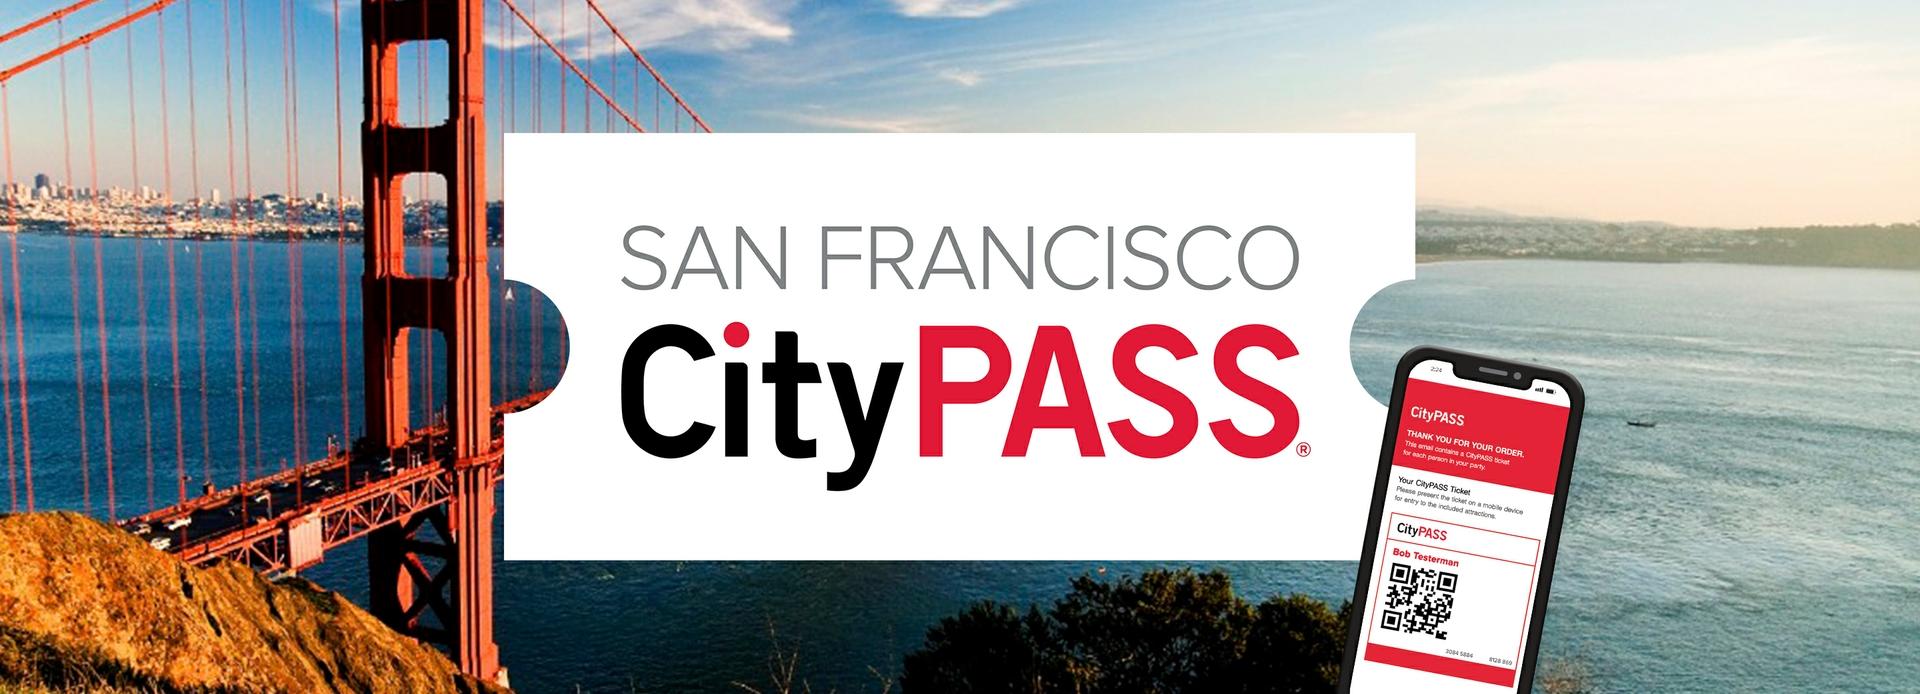 2021-2022 San Francisco CityPASS®